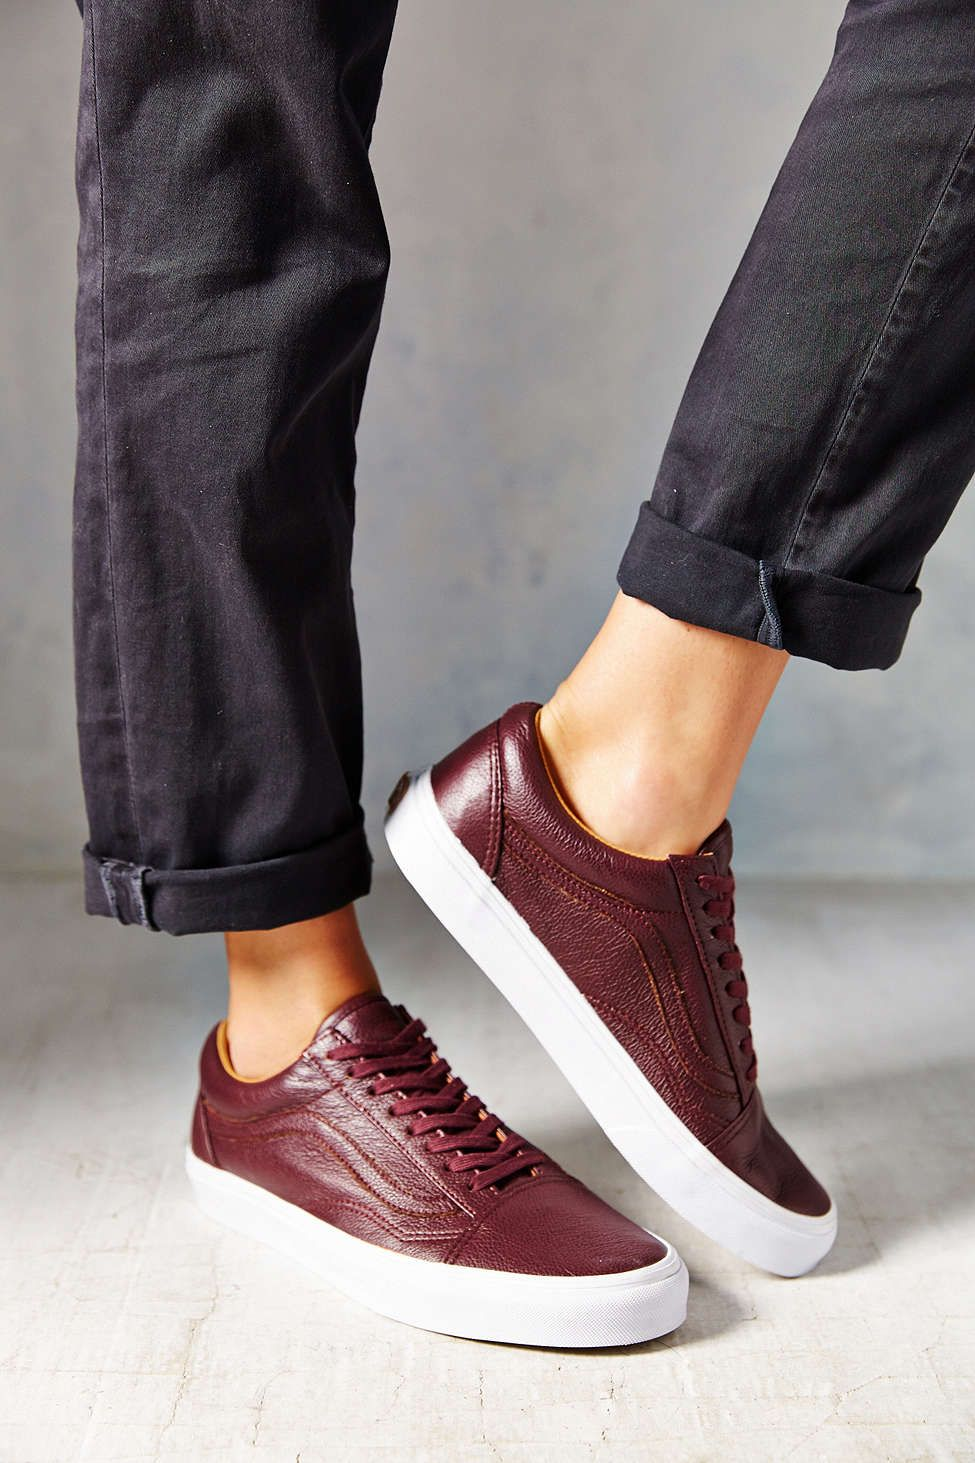 Vans Old Skool Premium Leather Low Top Women's Sneaker   Top